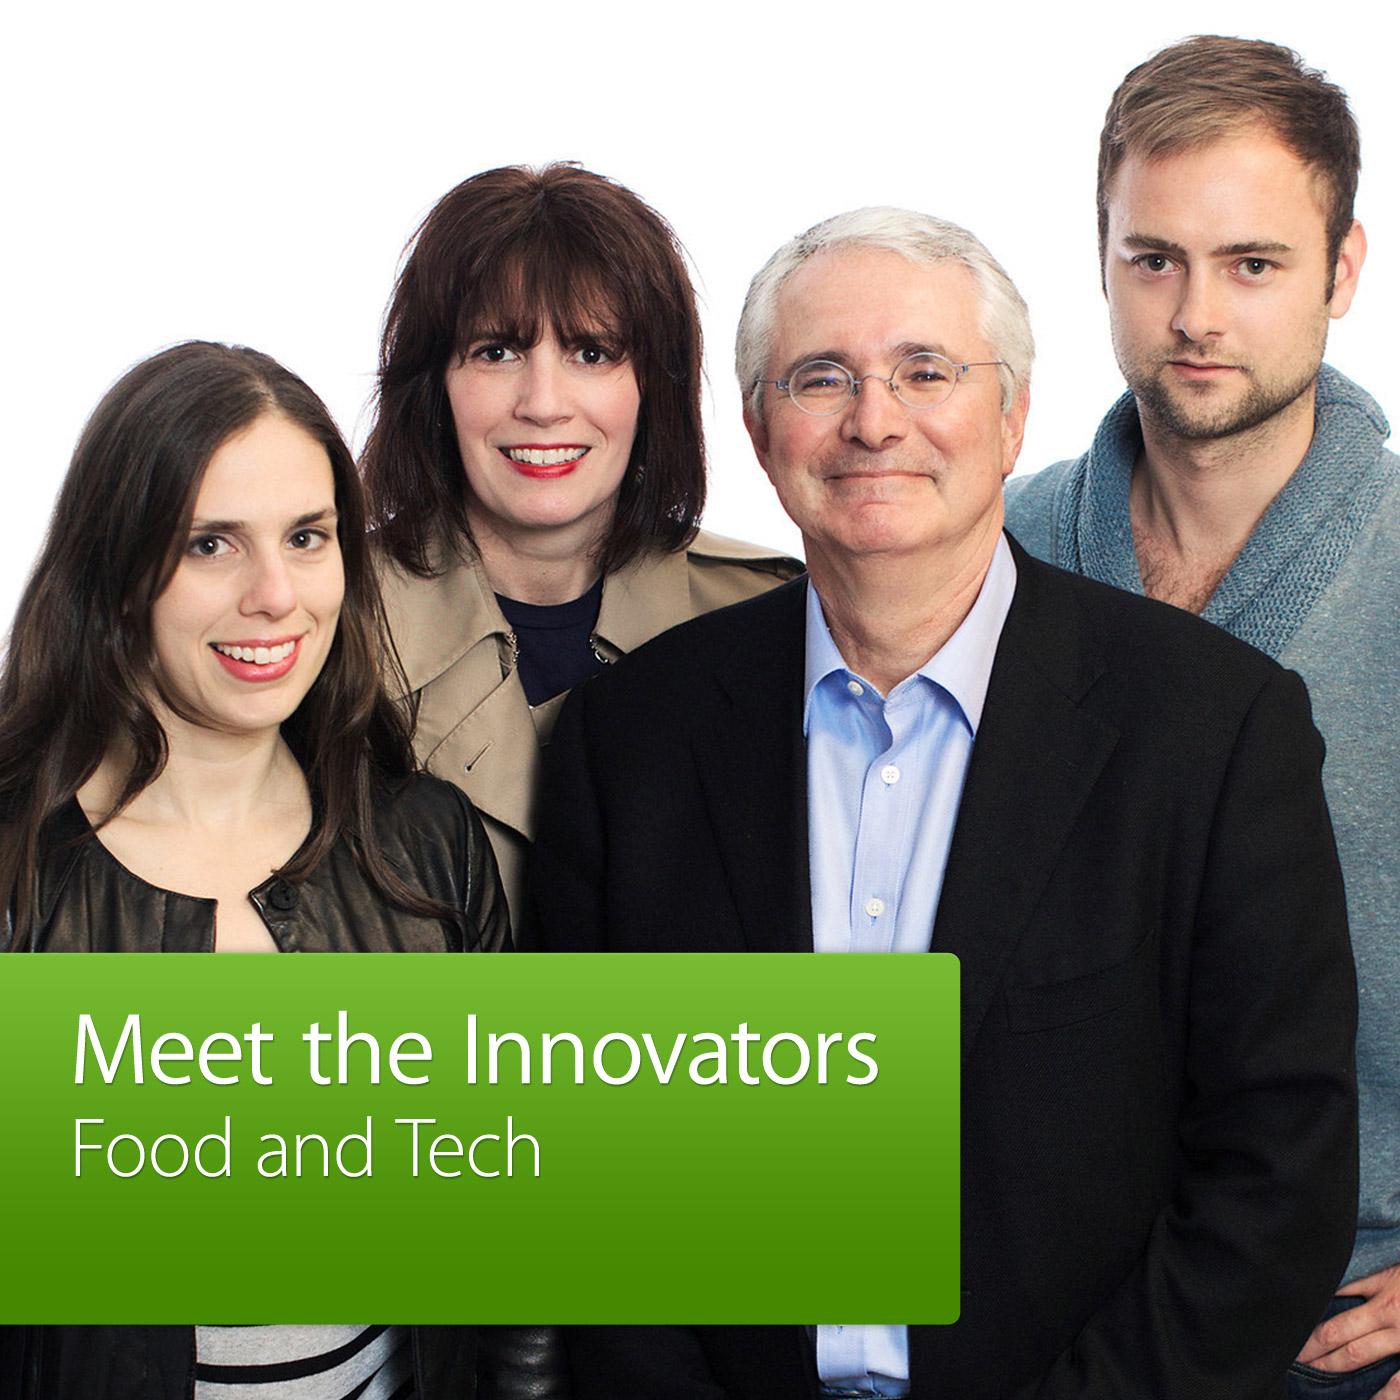 Food and Tech: Meet the Innovators